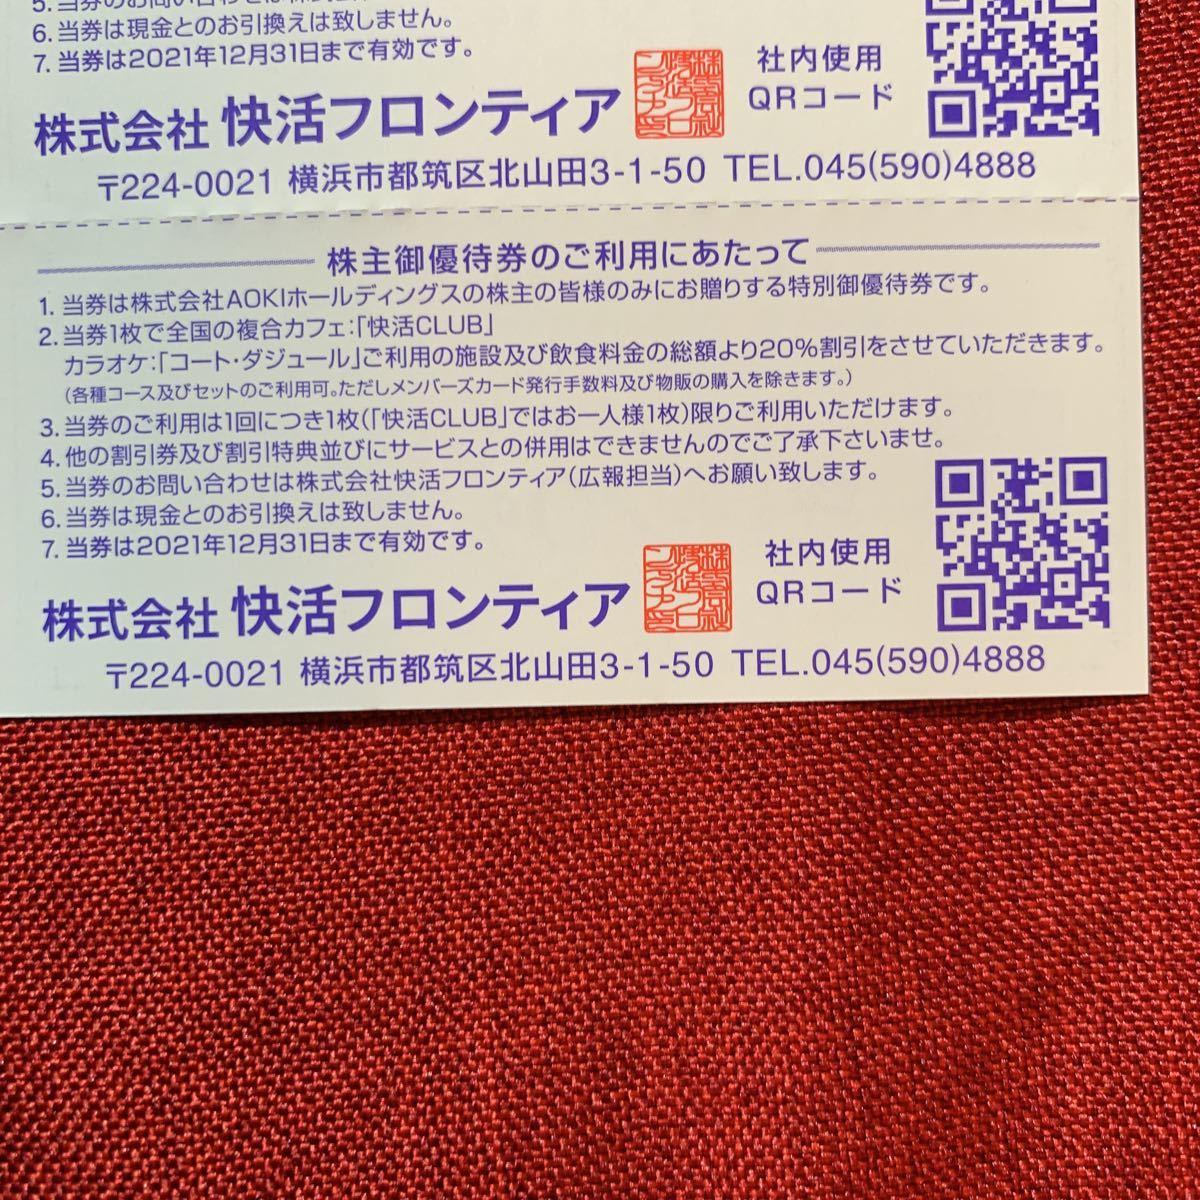 AOKIアオキホールディングス株主優待 快活clubコートダジュール優待20%割引券×5枚 20211231 複数個数あり_画像3